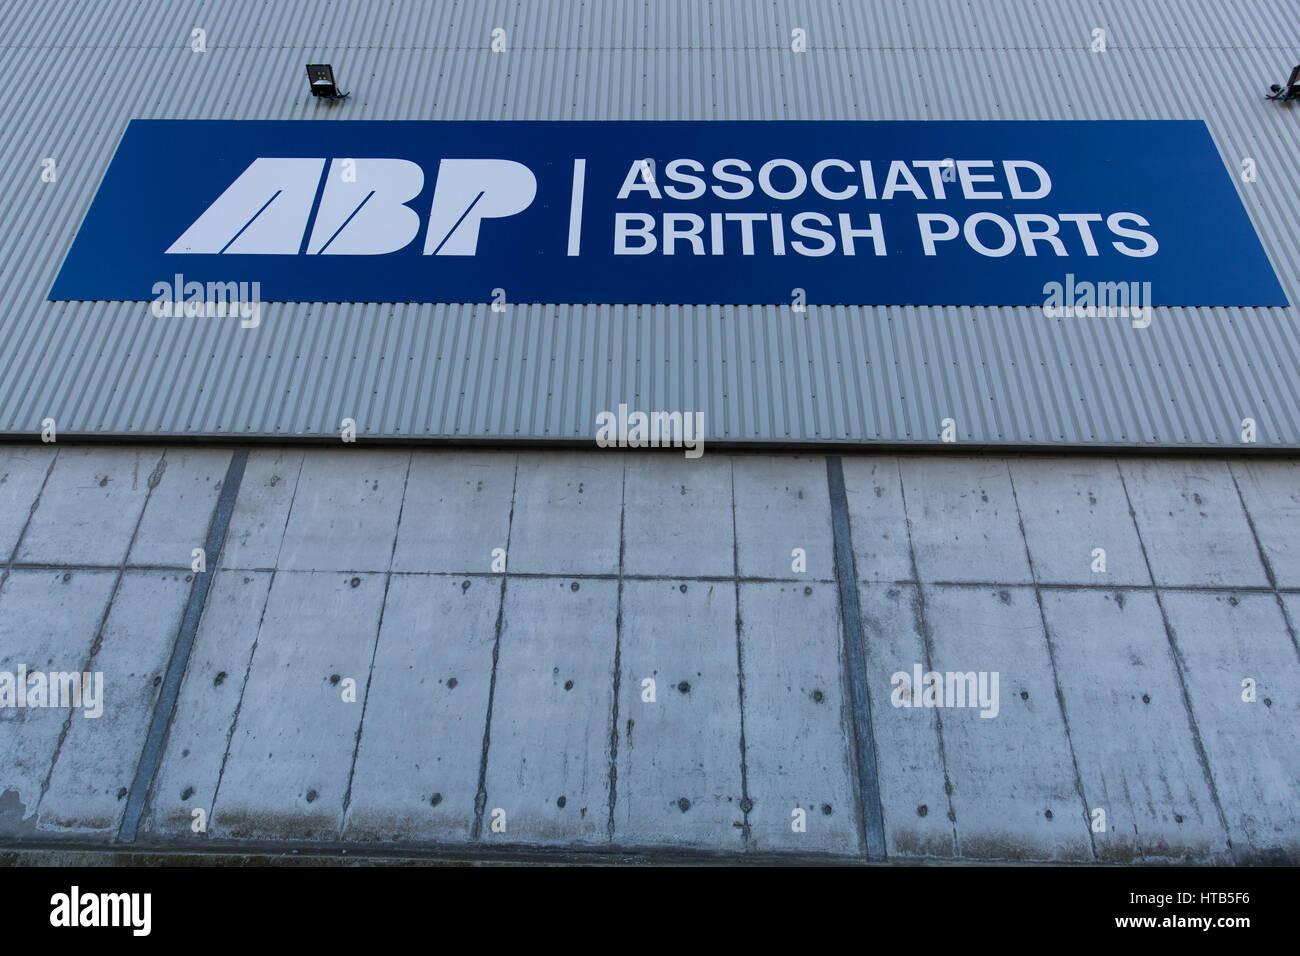 Associated British Ports signage at The Port of Garston. Stock Photo